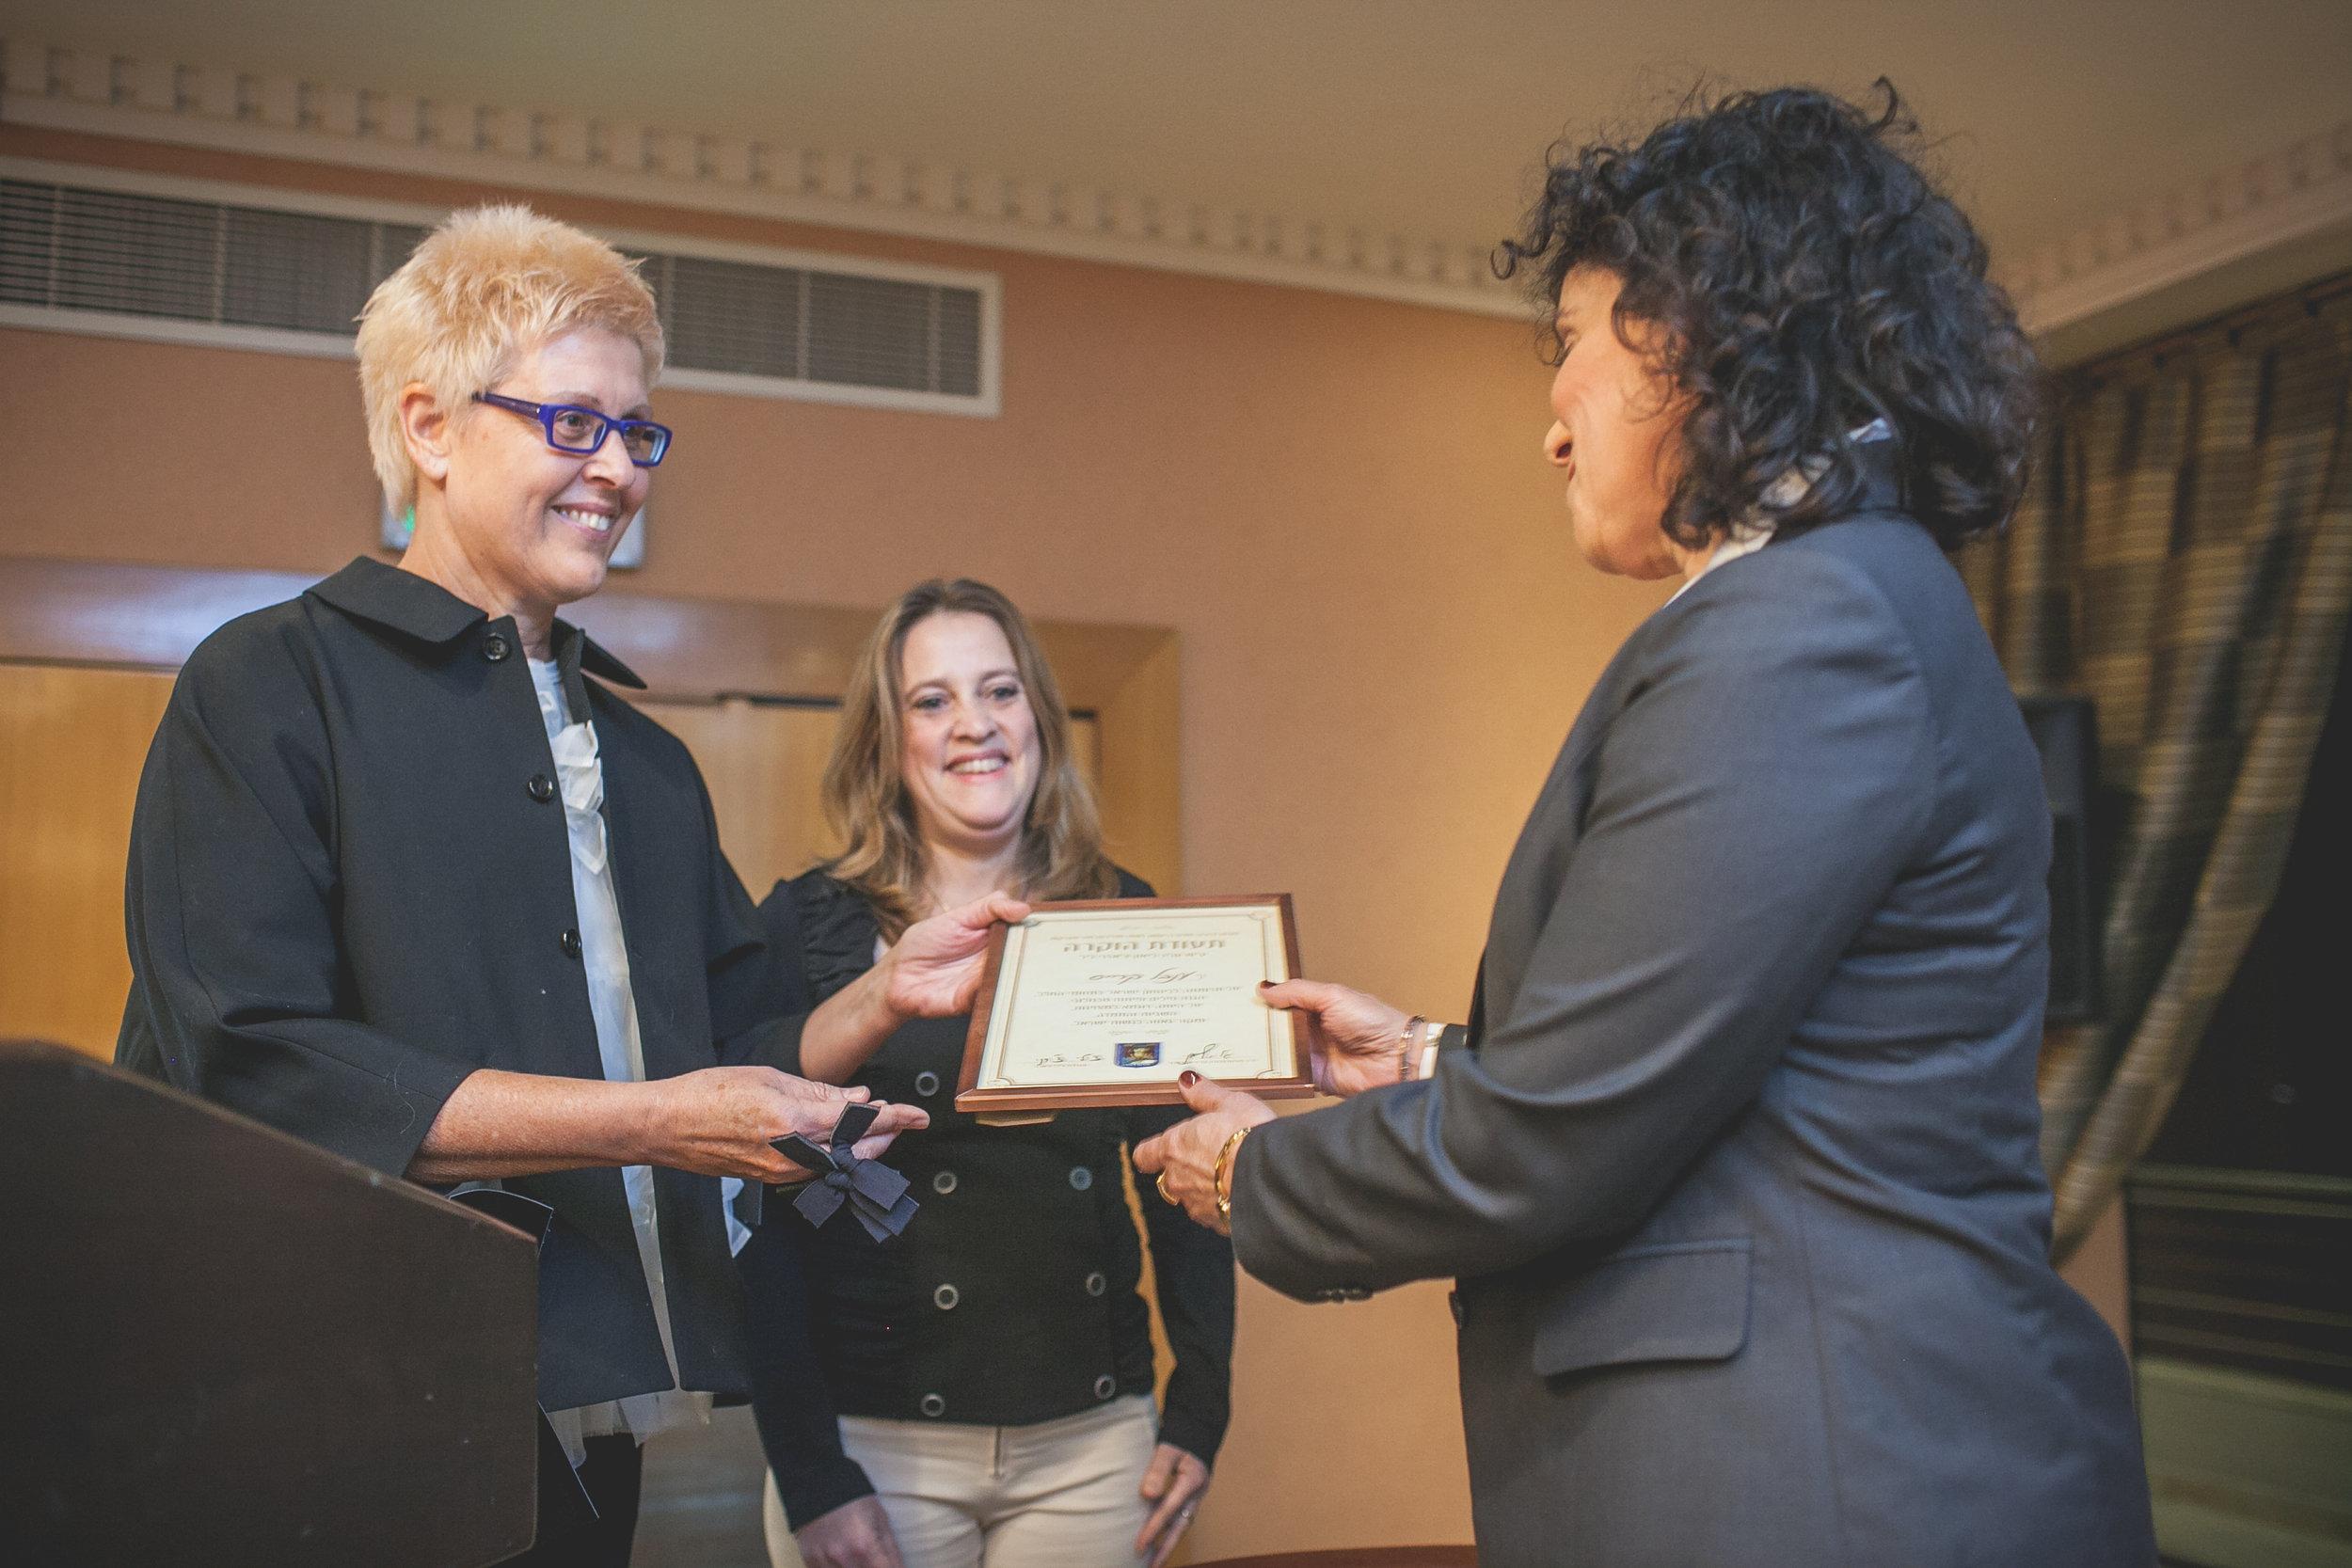 Ms. Tzili Charney presenting the award to Ms. Inbal Kreis